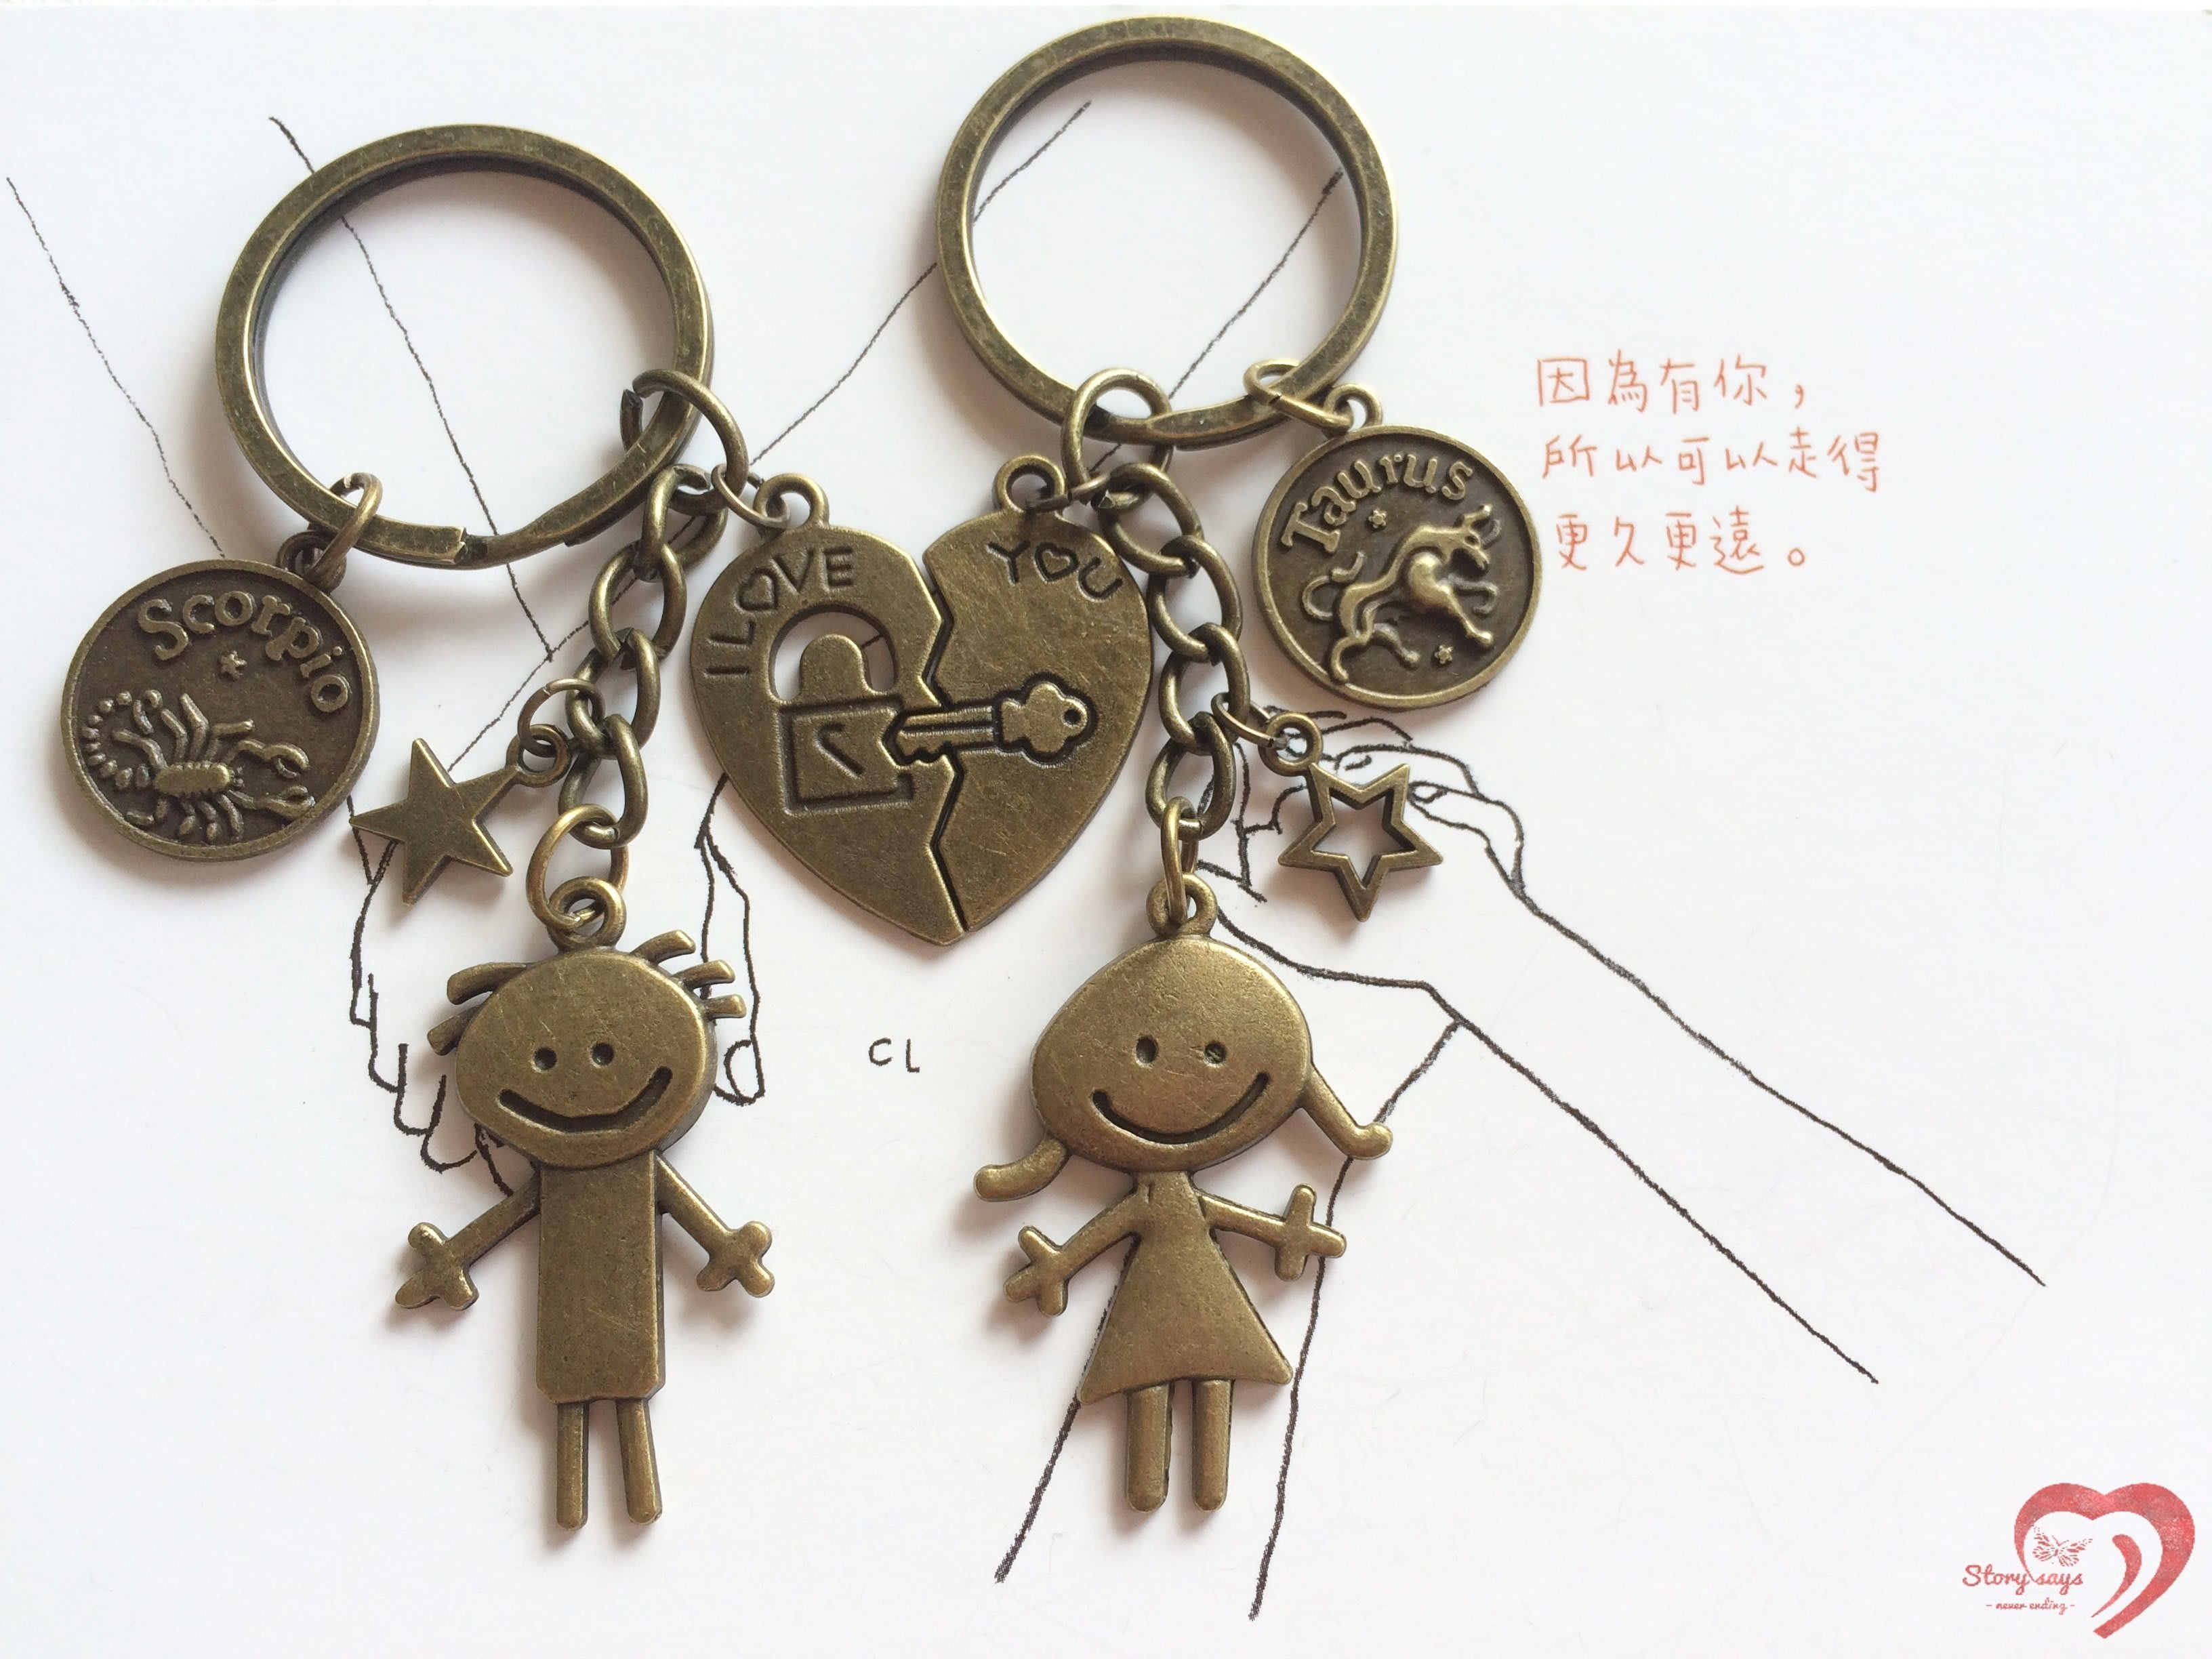 ♥ STORY SAYS ♥【我們的愛情故事】手創 客製 愛心鎖男孩女孩古銅成對鑰匙圈 吊飾 情侶 紀念日 禮物 情人節